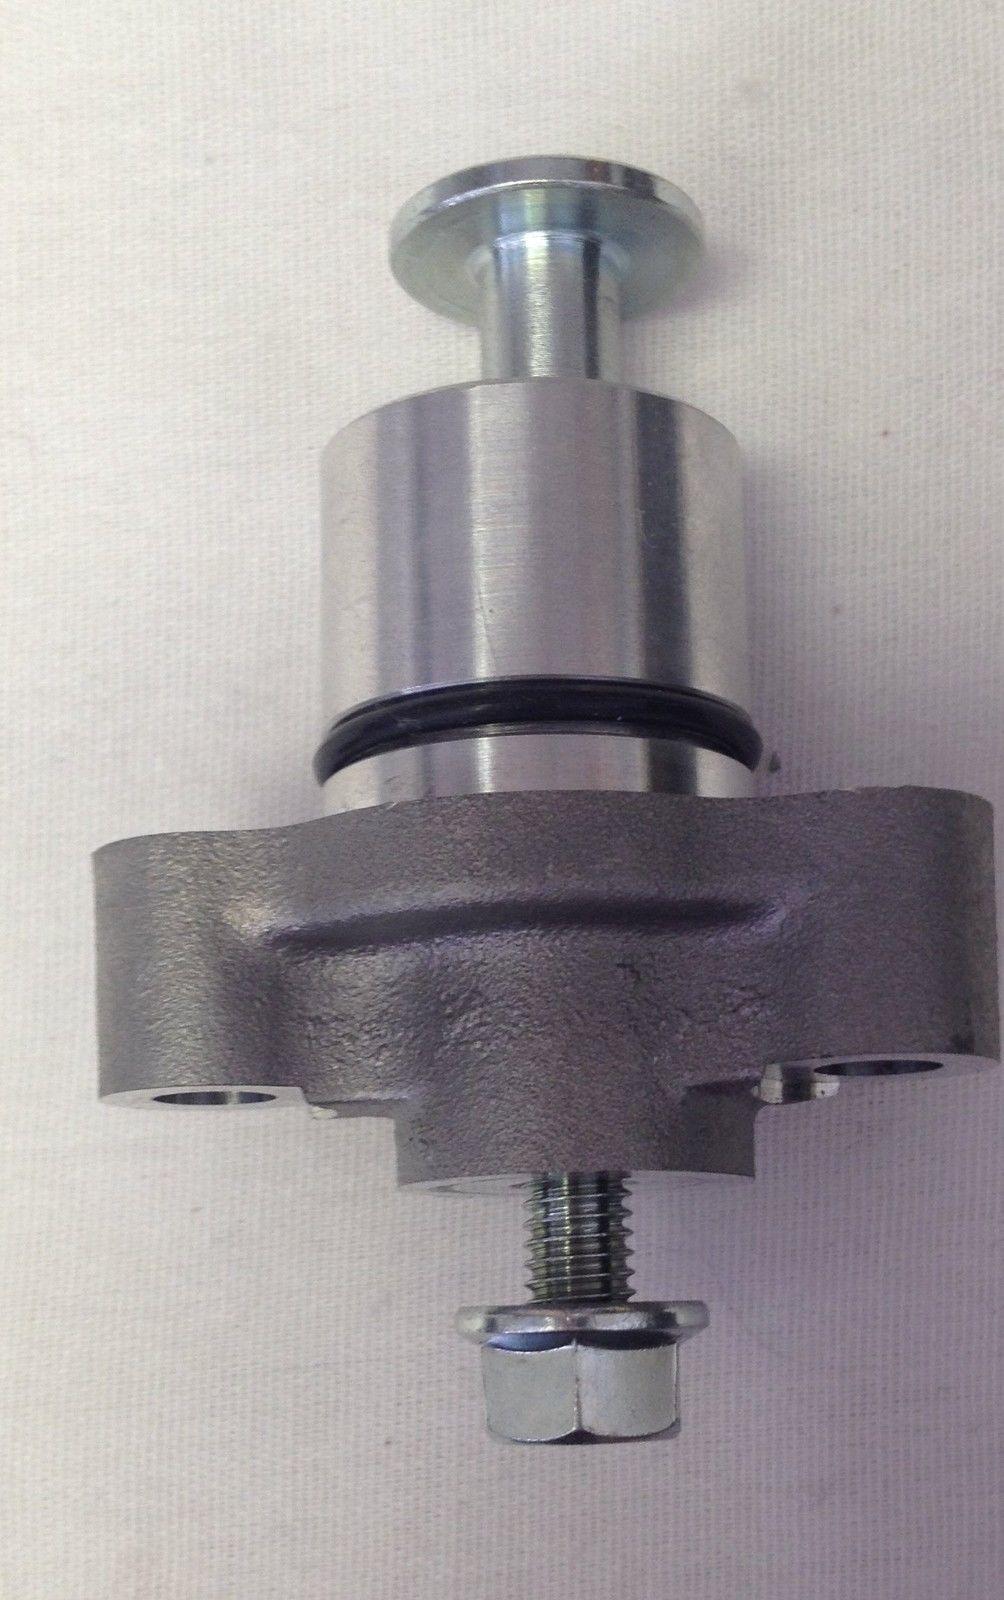 12048-0028 manual cam chain adjuster KIT-4